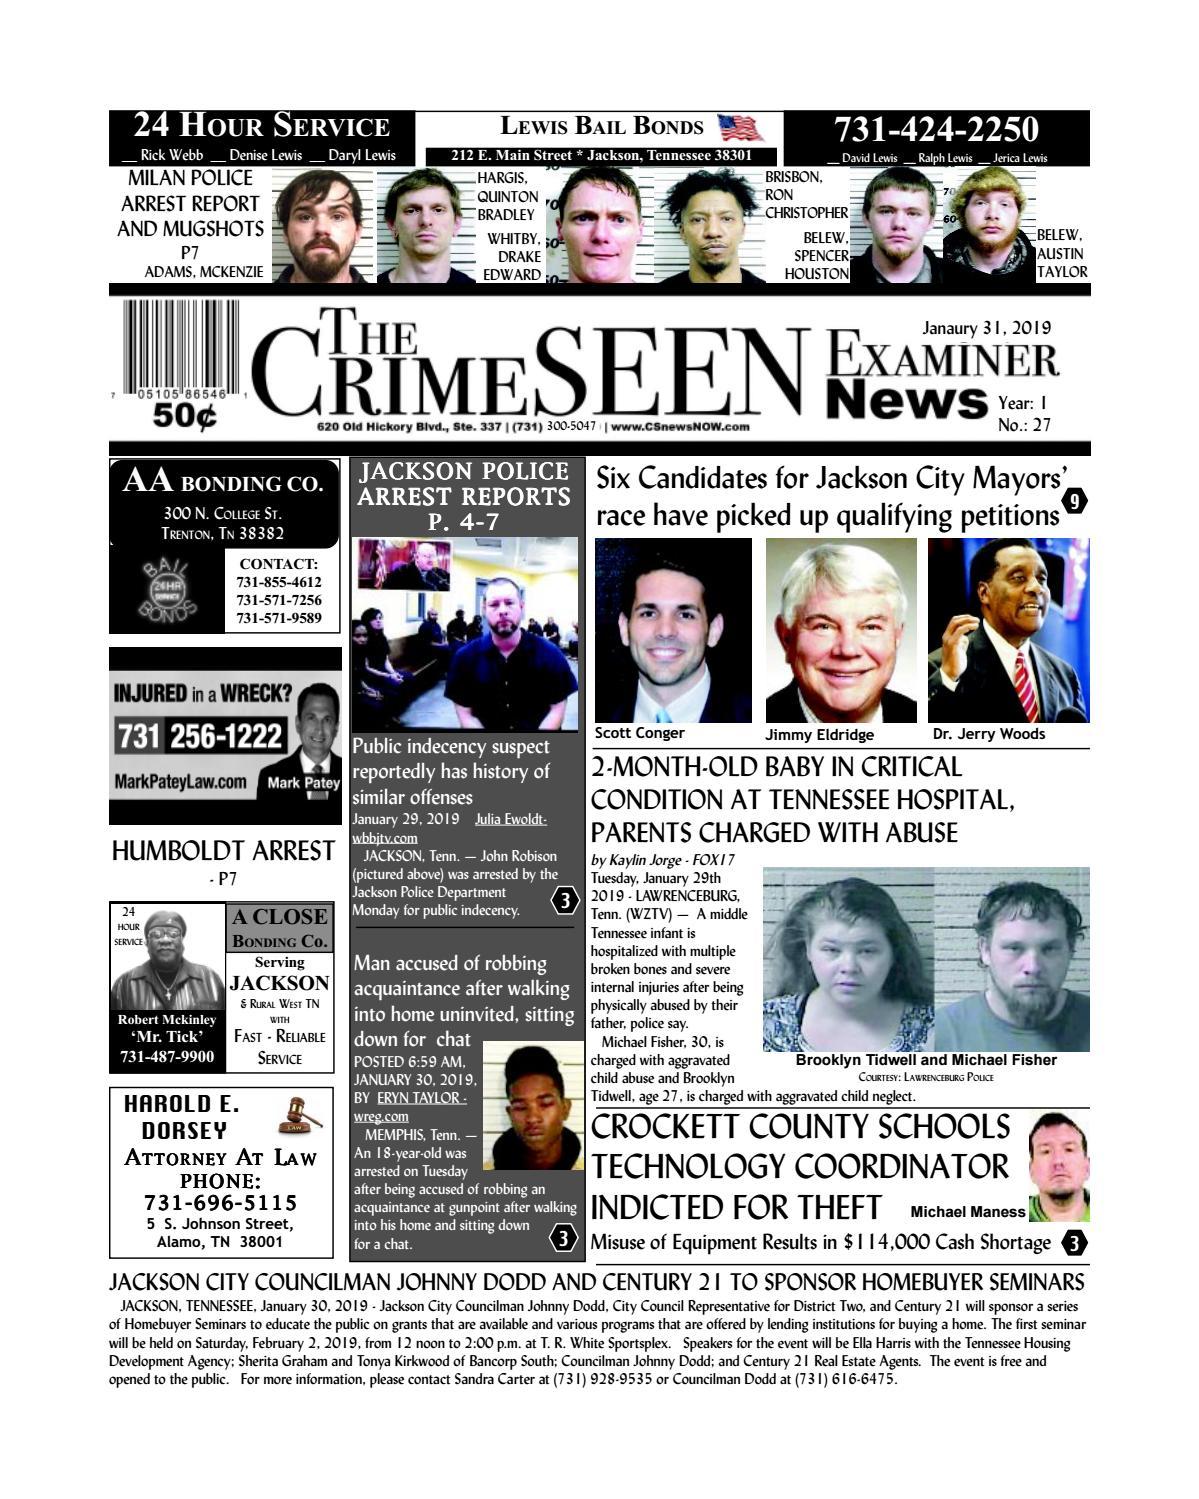 The CrimeSEEN Examiner News January 31, 2019 by CrimeSEEN